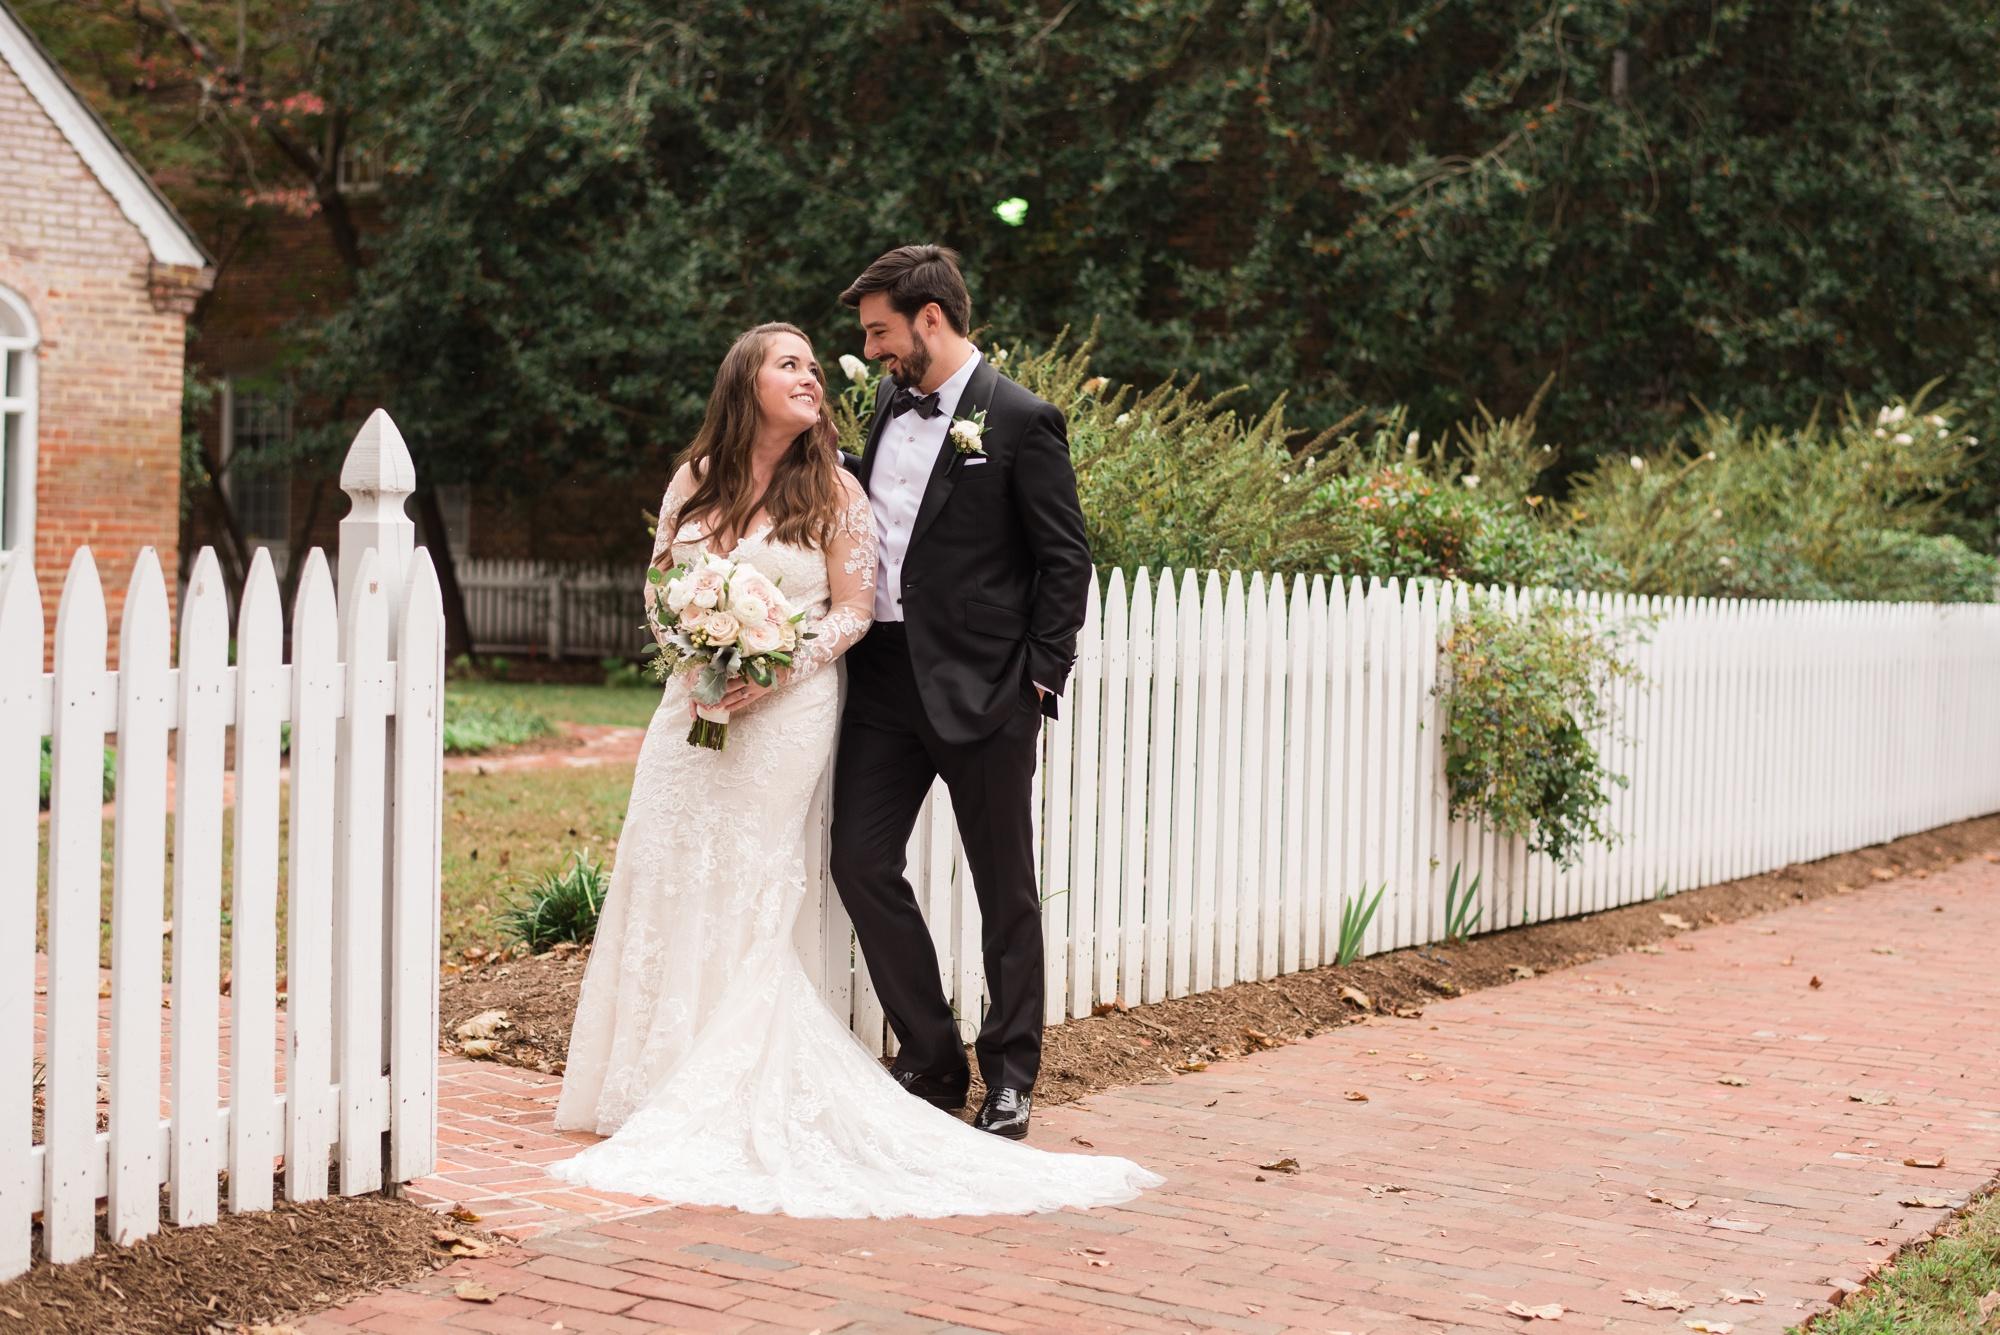 Tidewater Inn wedding white picket fence